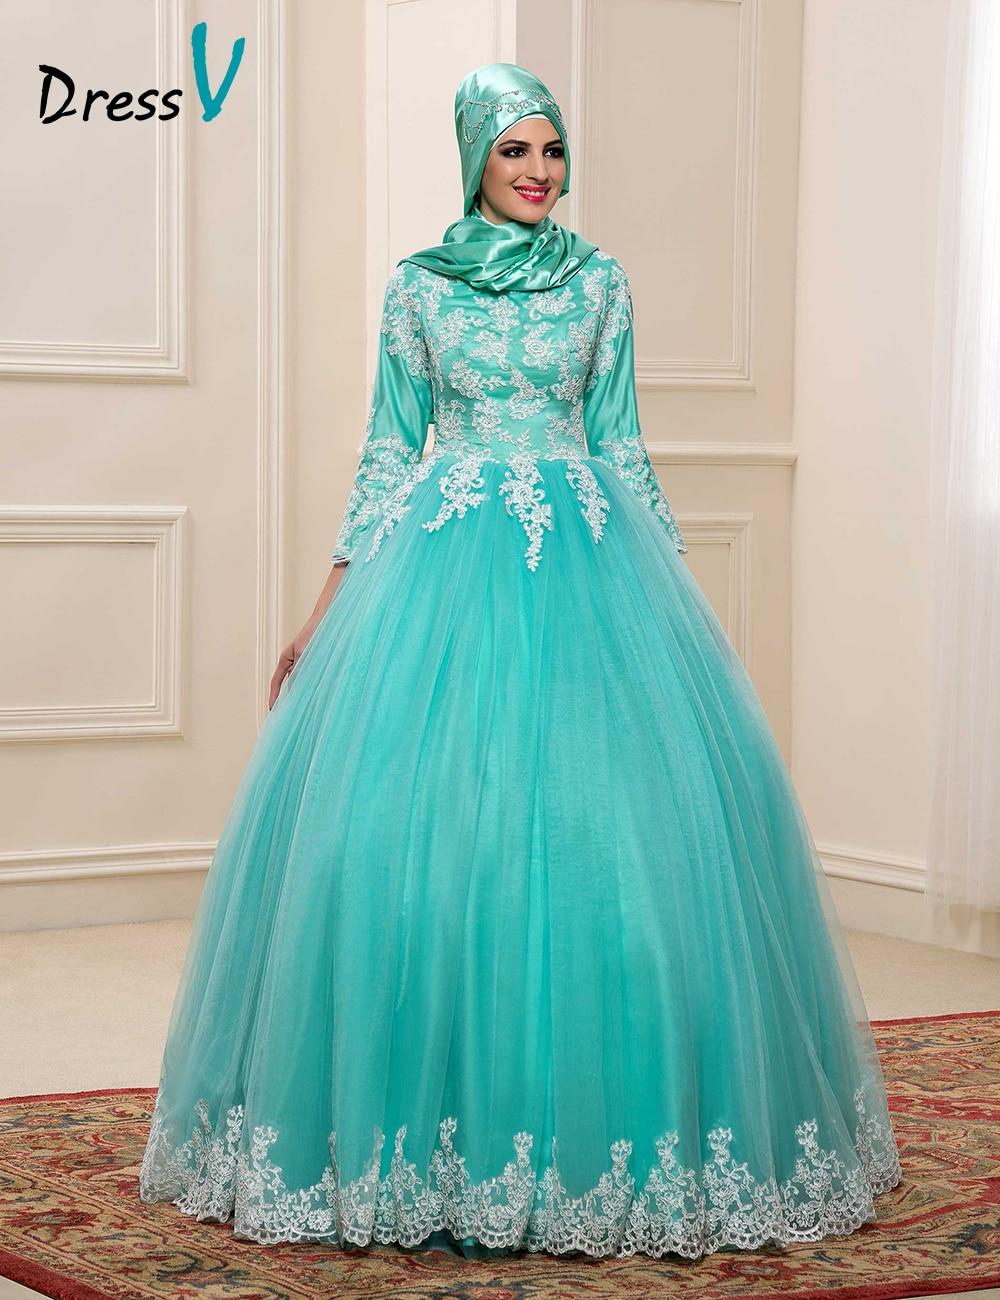 2017 Muslim Wedding Dresses With Hijab High Neck 3 4 Sleeves Mint Color Bridal Kaftan